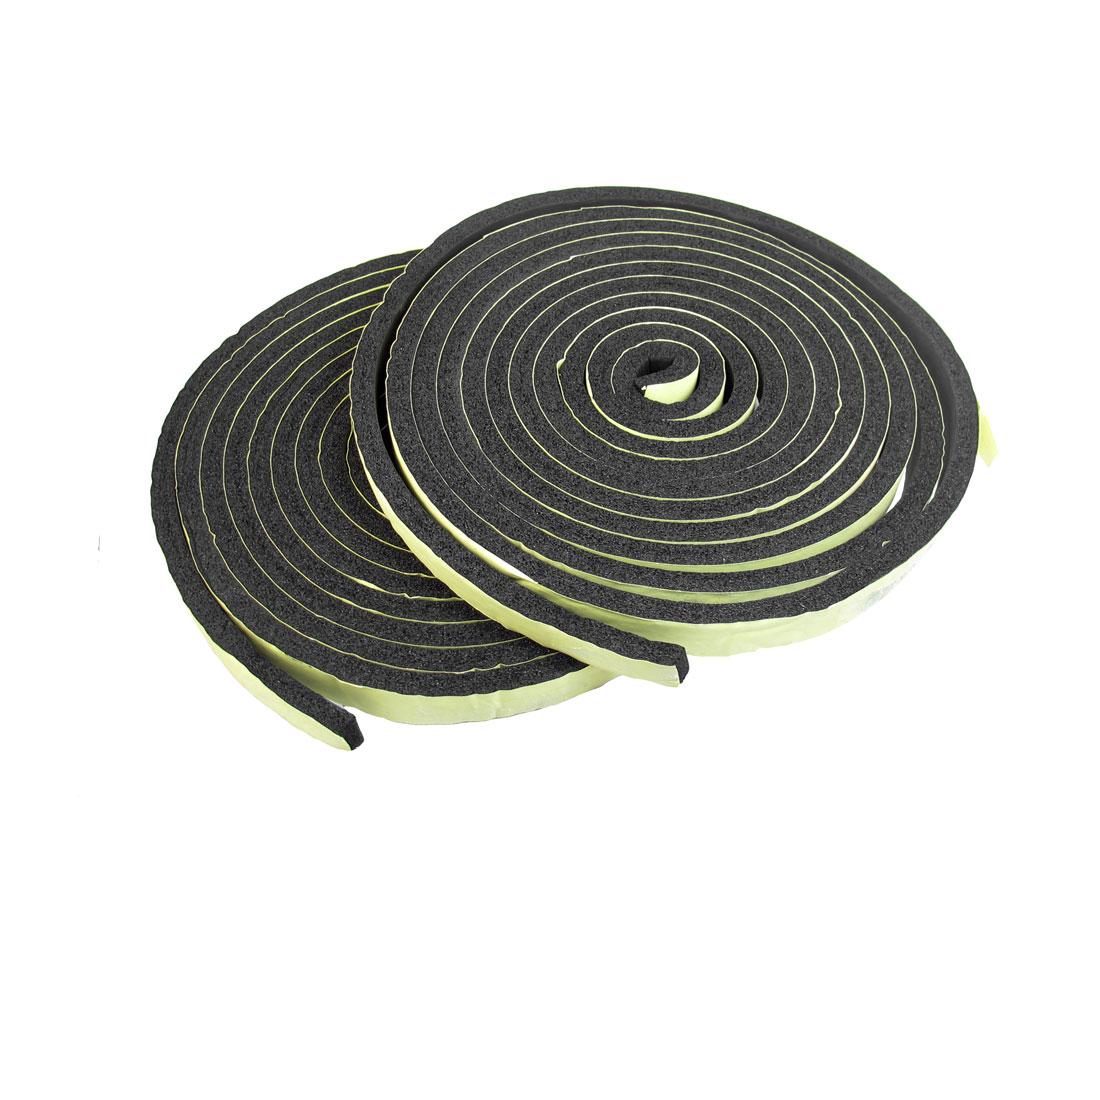 2 Pack Black Sponge Adhesive Back Car Sealed Strip 5M x 2cm